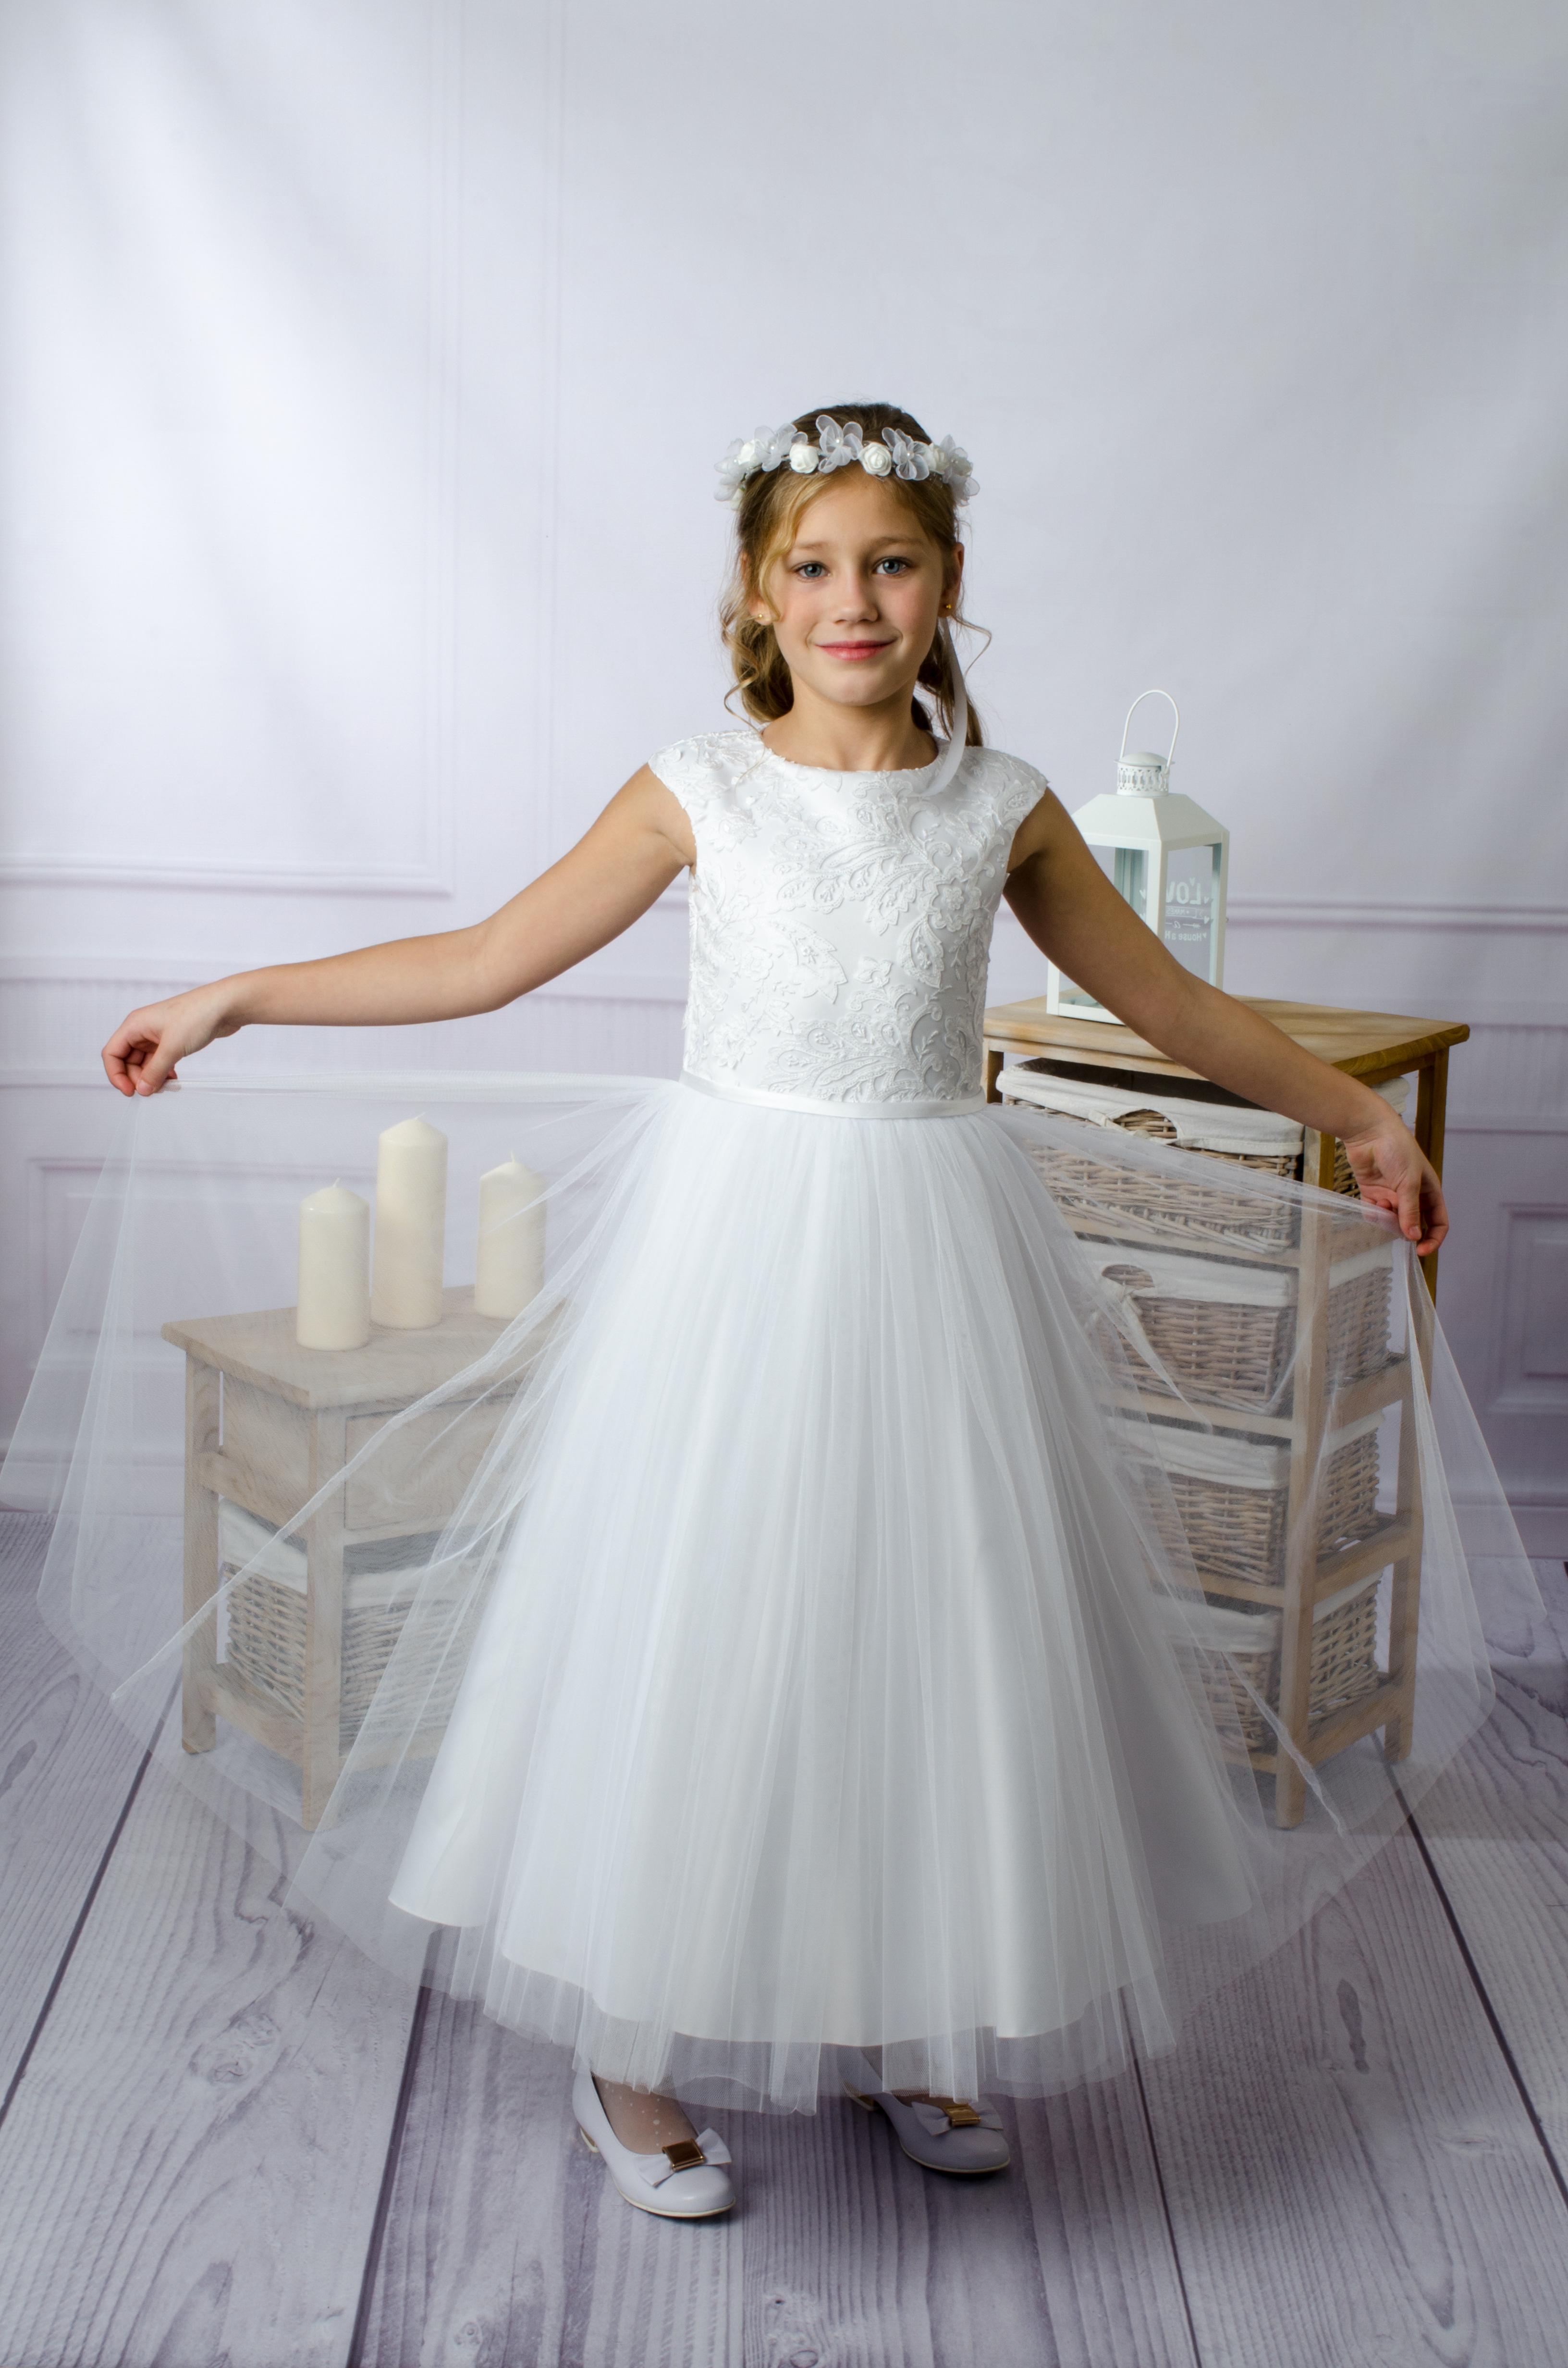 7b8229e6d9 Sukienka komunijna Adrianna skromna i delikatna z koronką u góry